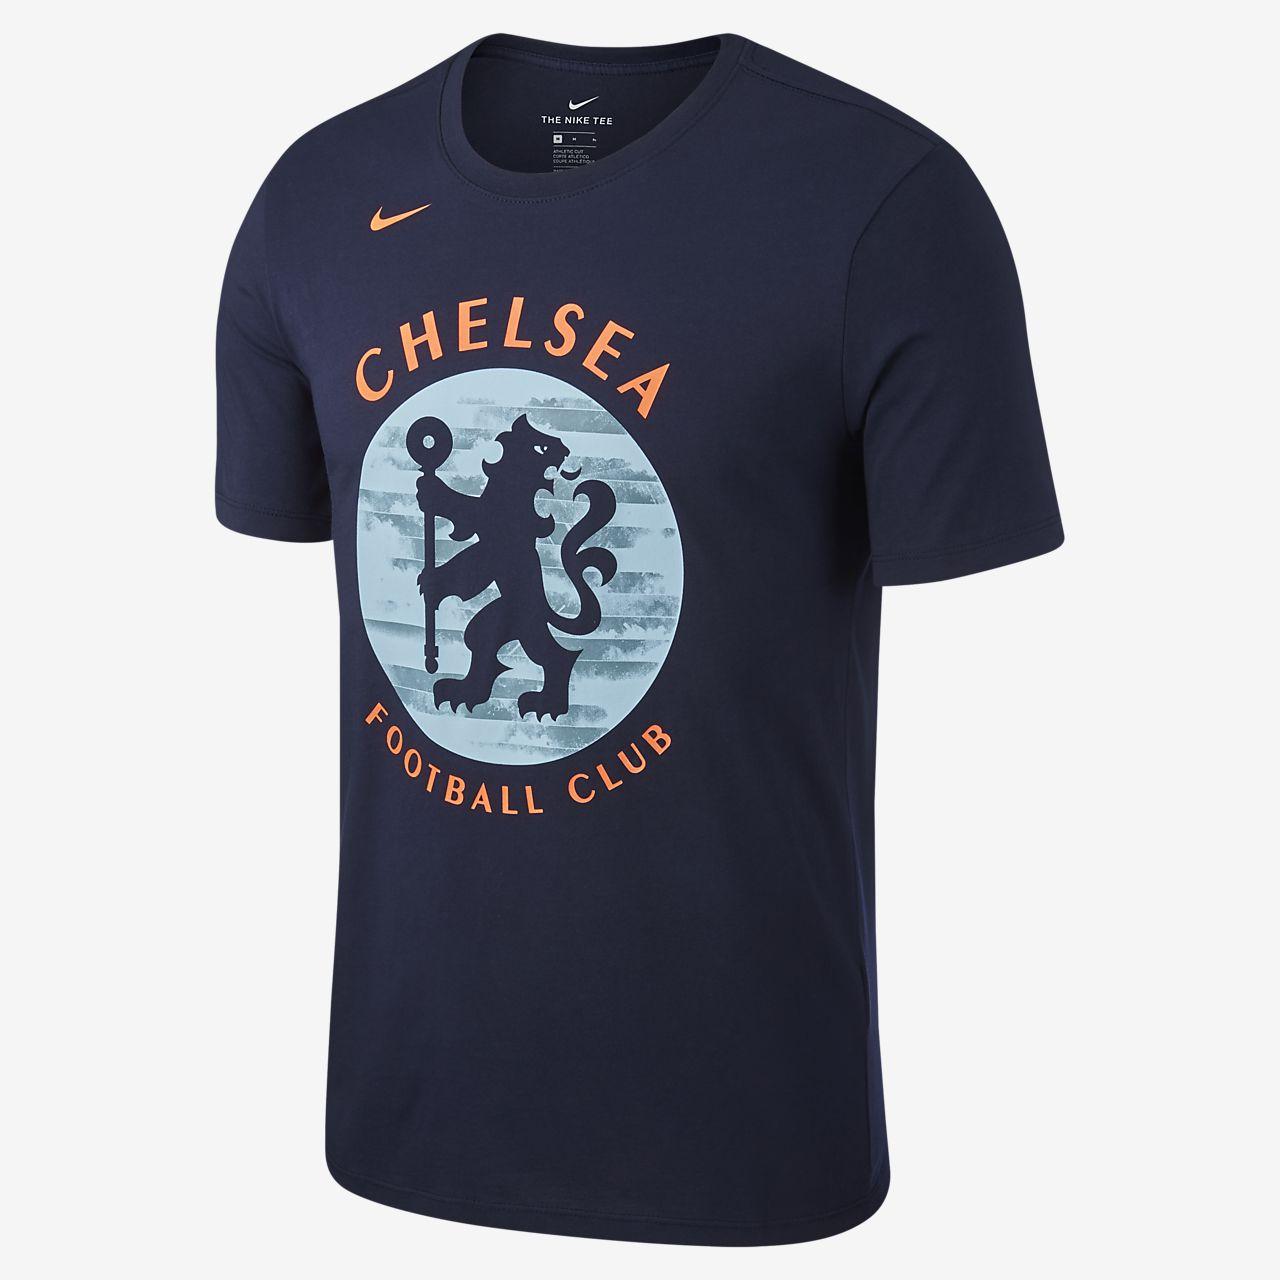 Chelsea FC Men's T-Shirt